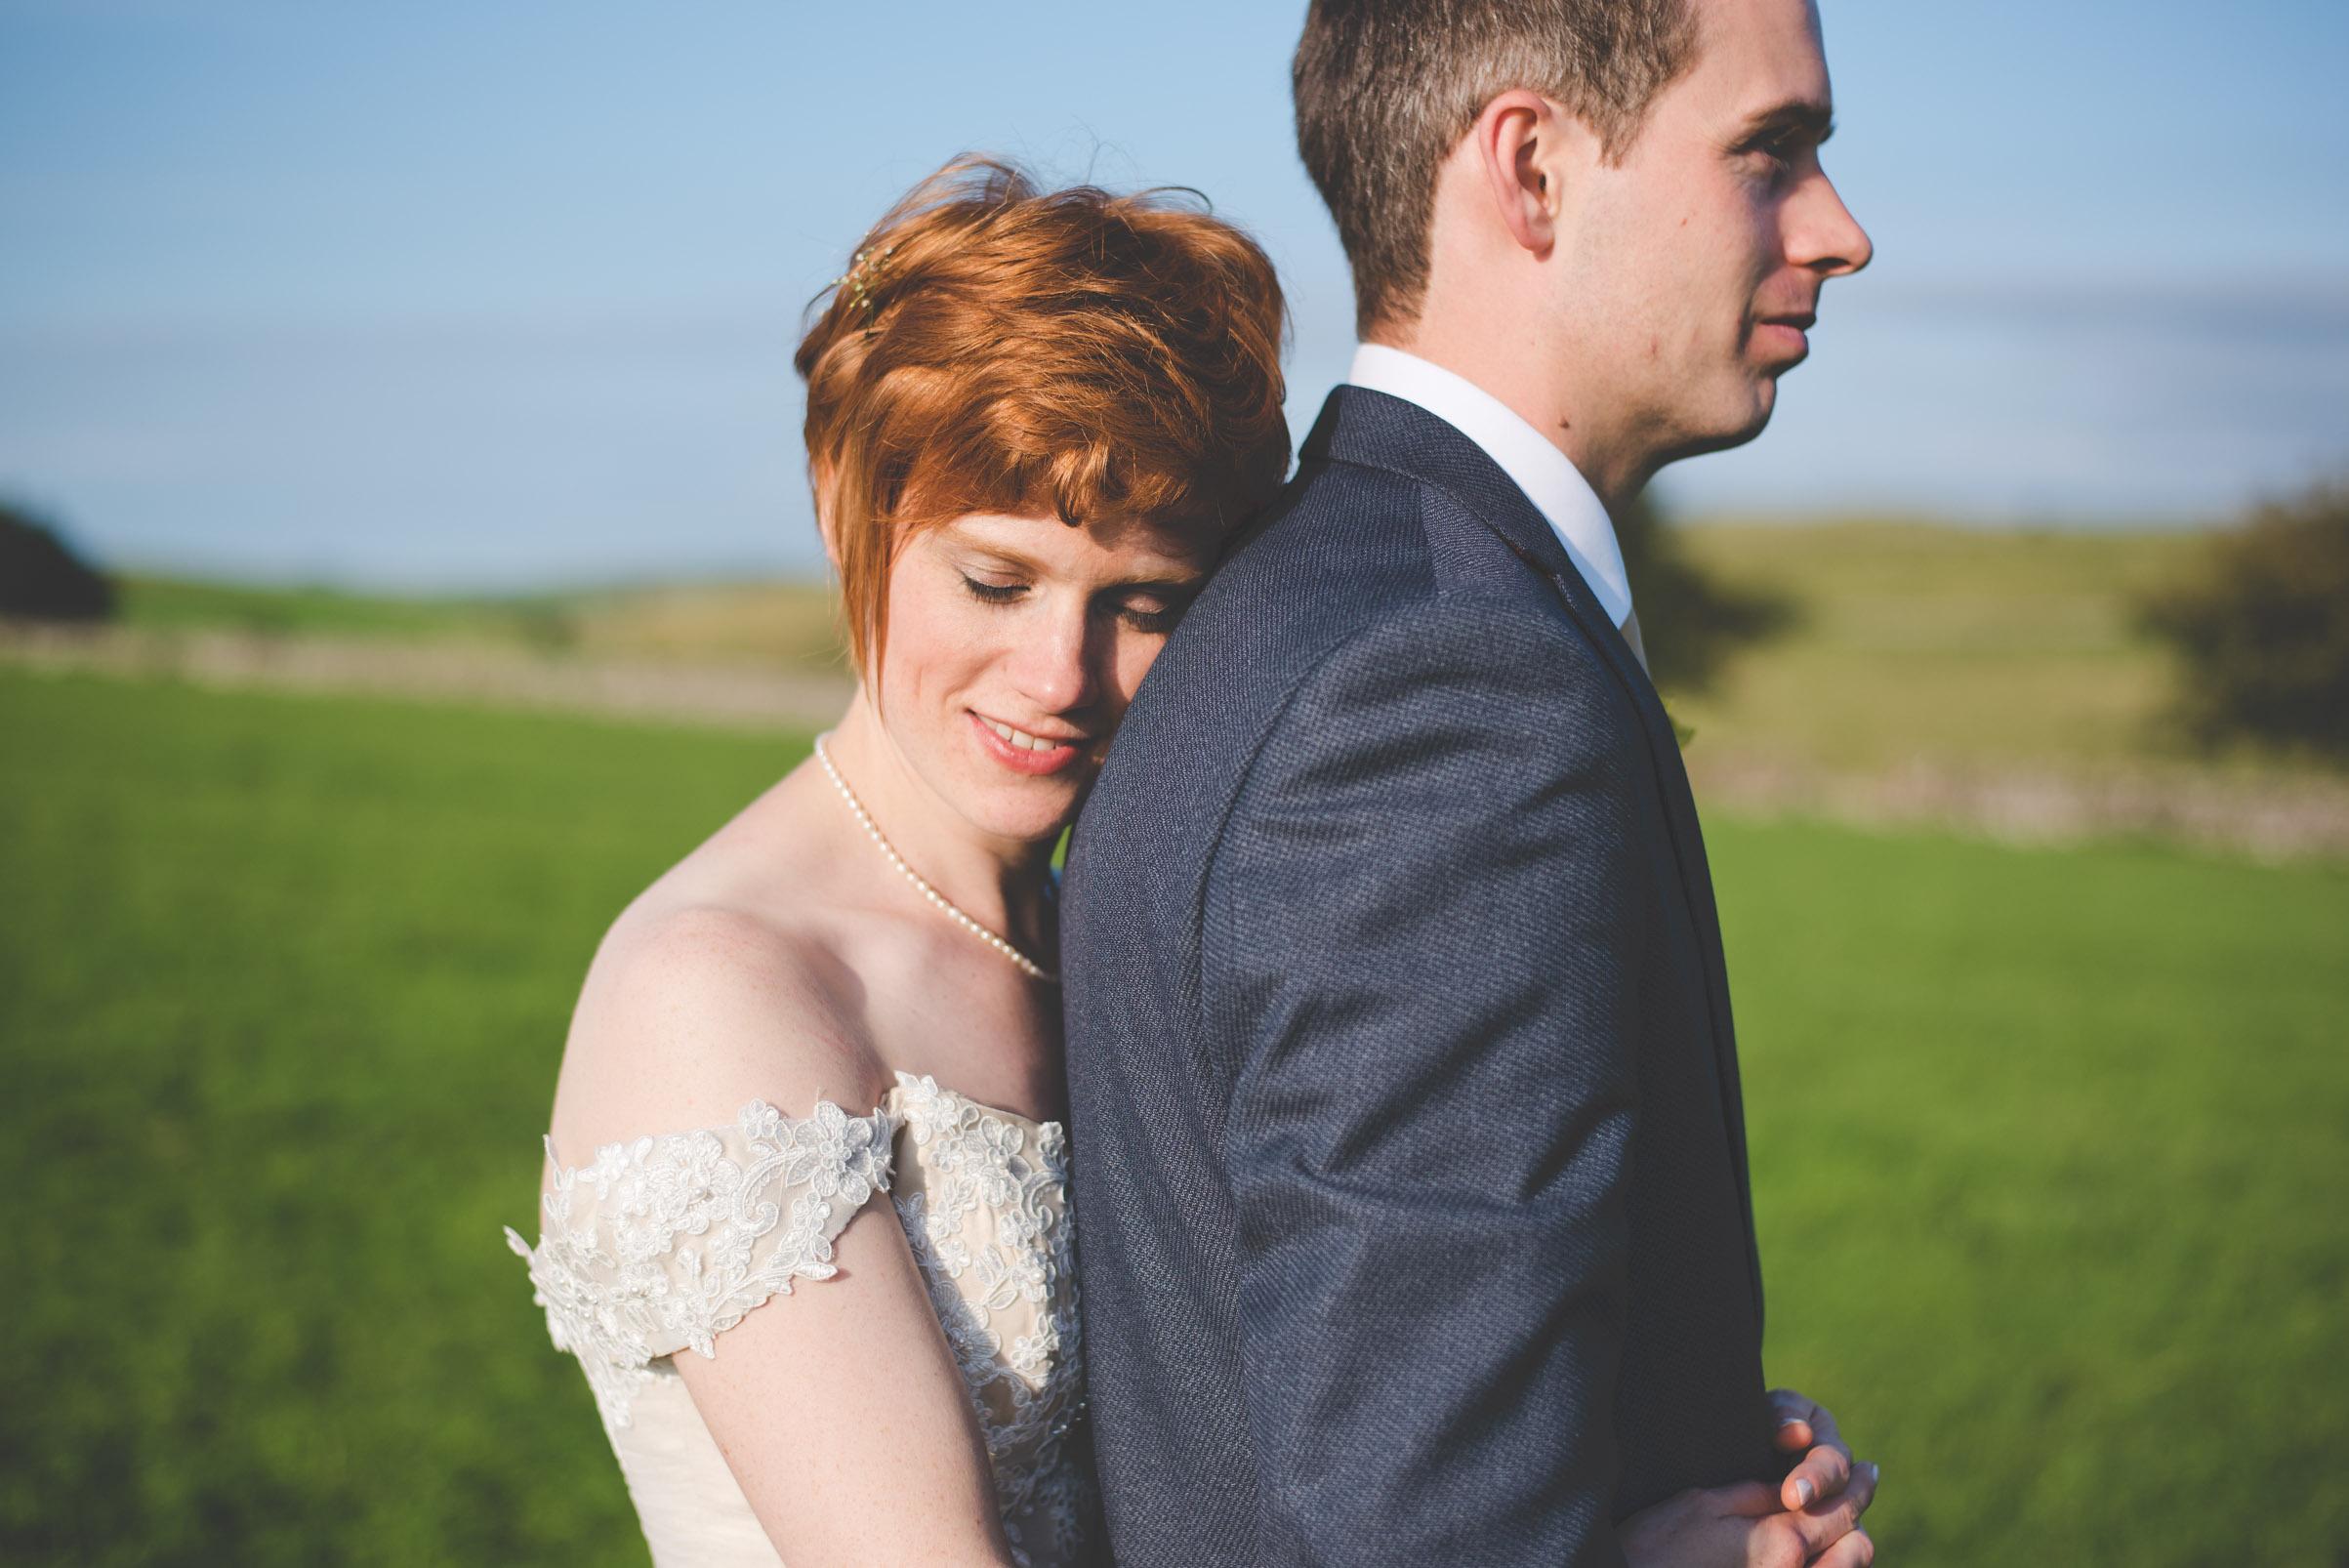 Peak+district+farm+wedding+lower+damgate+photographer-193.jpg